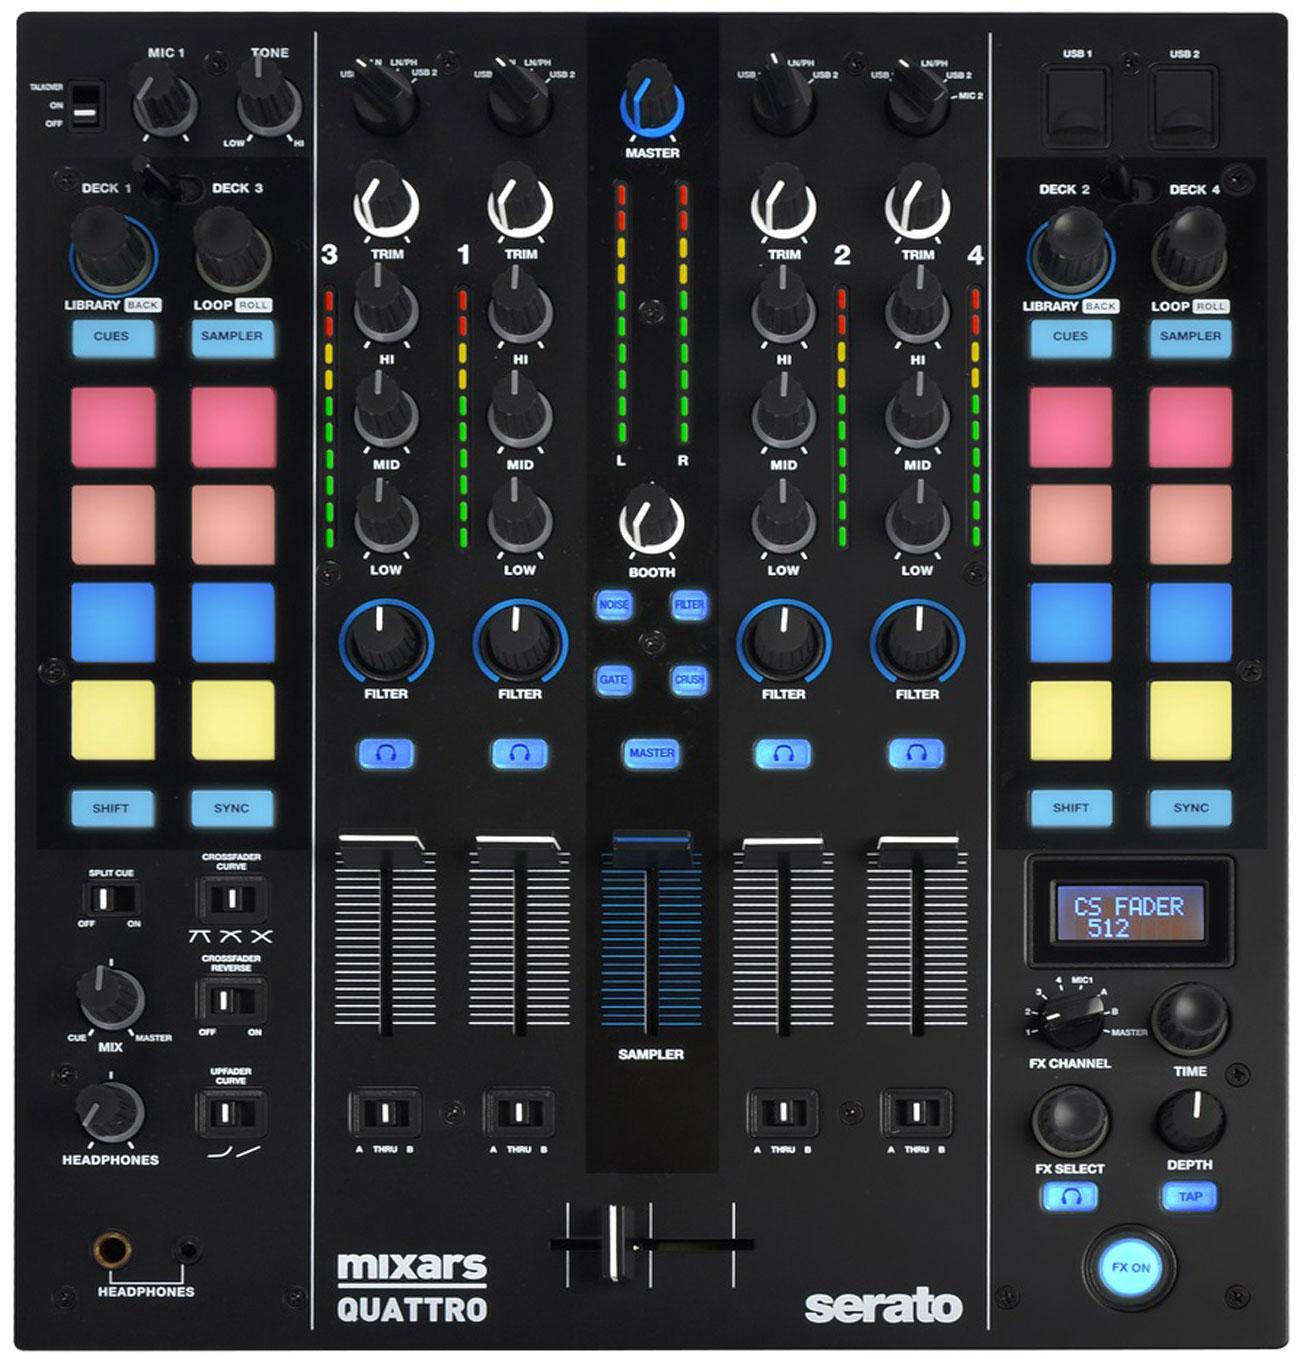 Table de mixage DJ Mixars Quattro avec Serato Pro (recordcase.de)